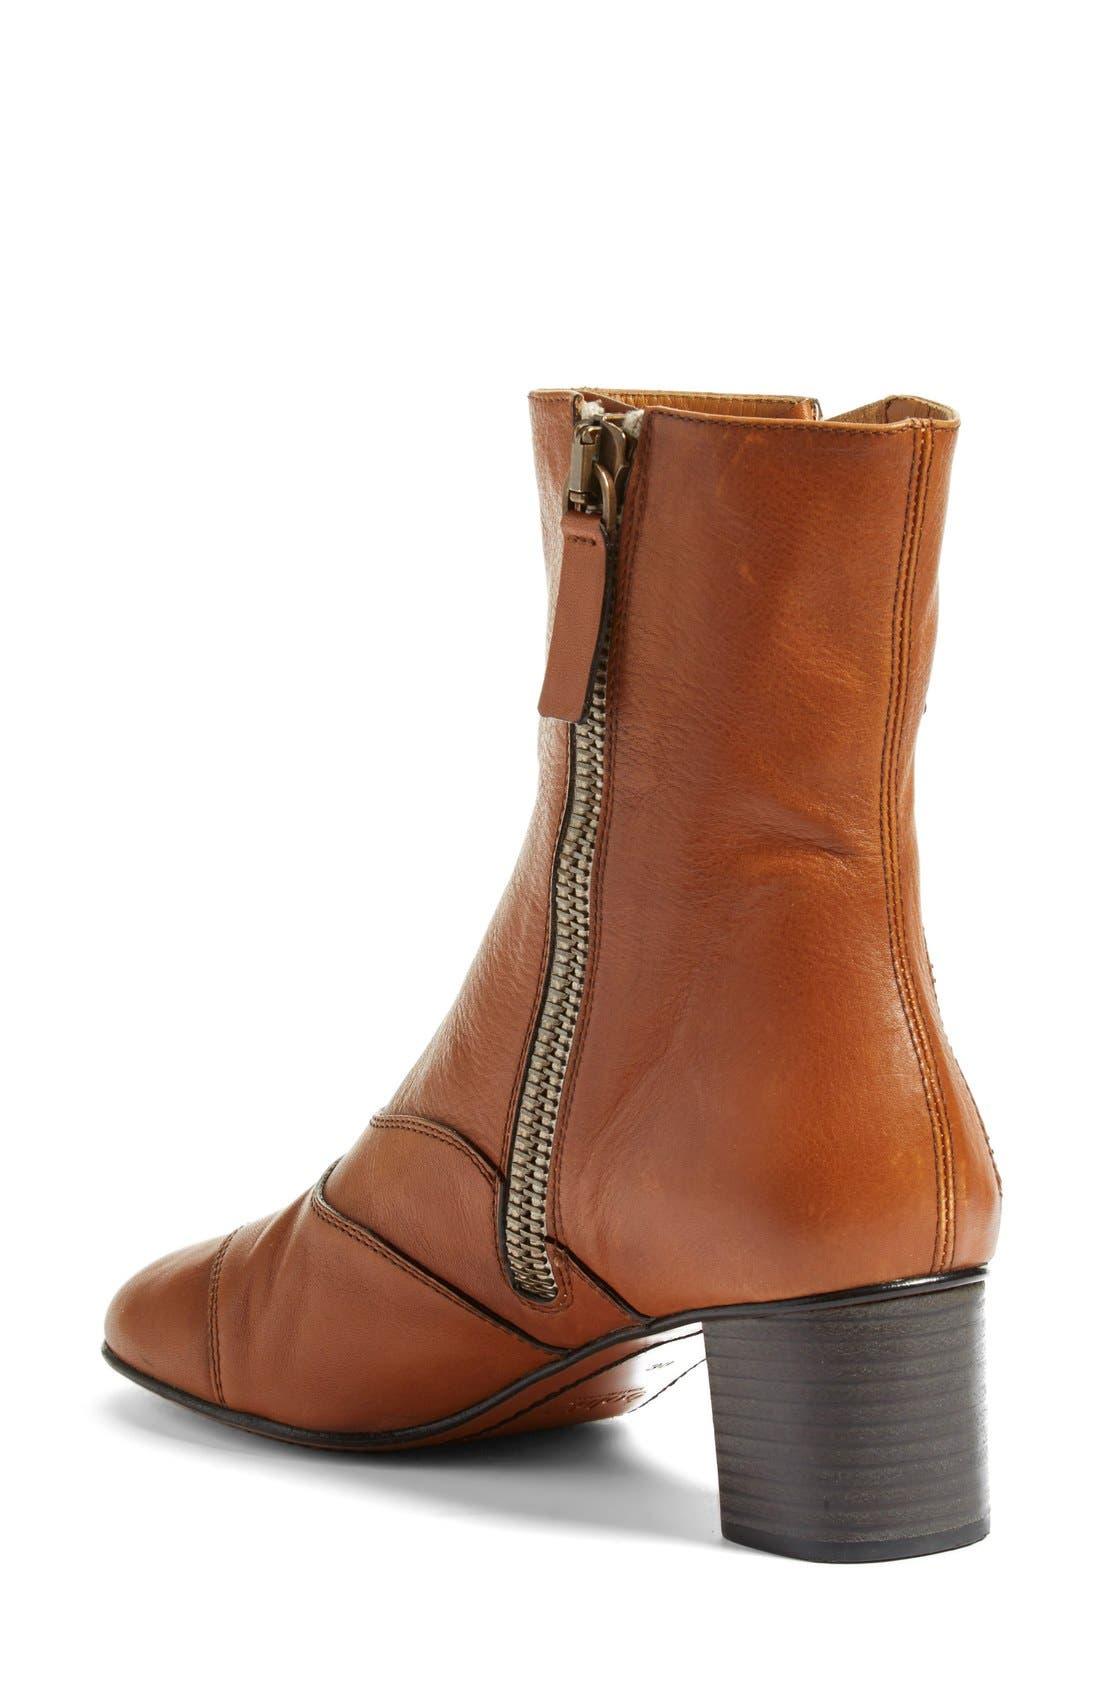 'Lexie' Block Heel Boot,                             Alternate thumbnail 4, color,